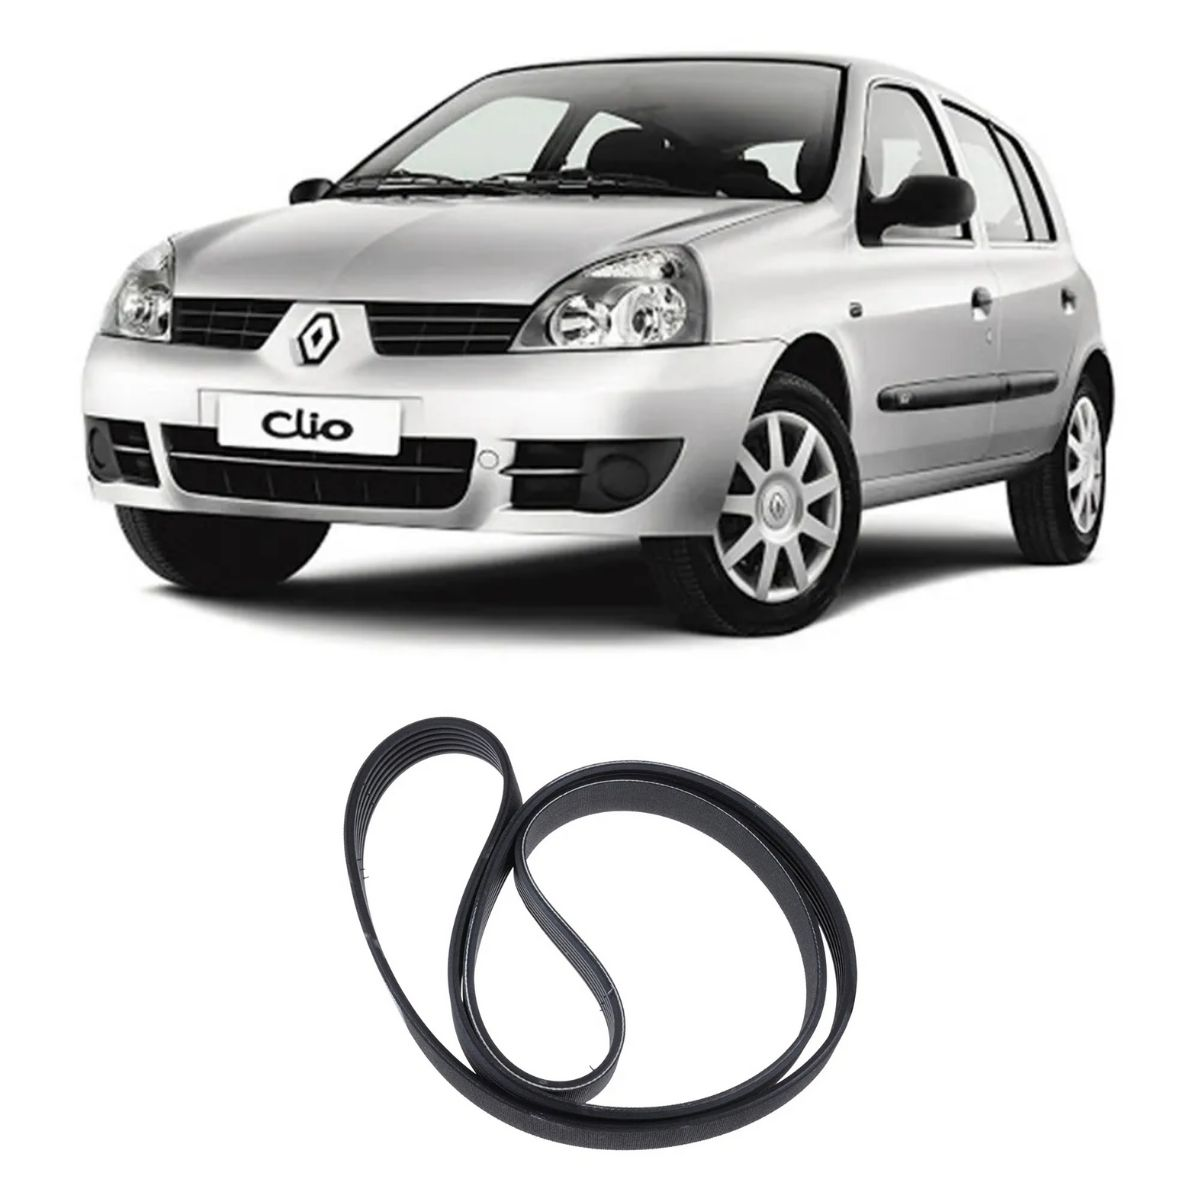 Correia Multi V Clio 1.0 16v 2000/2012 Logan 2007/